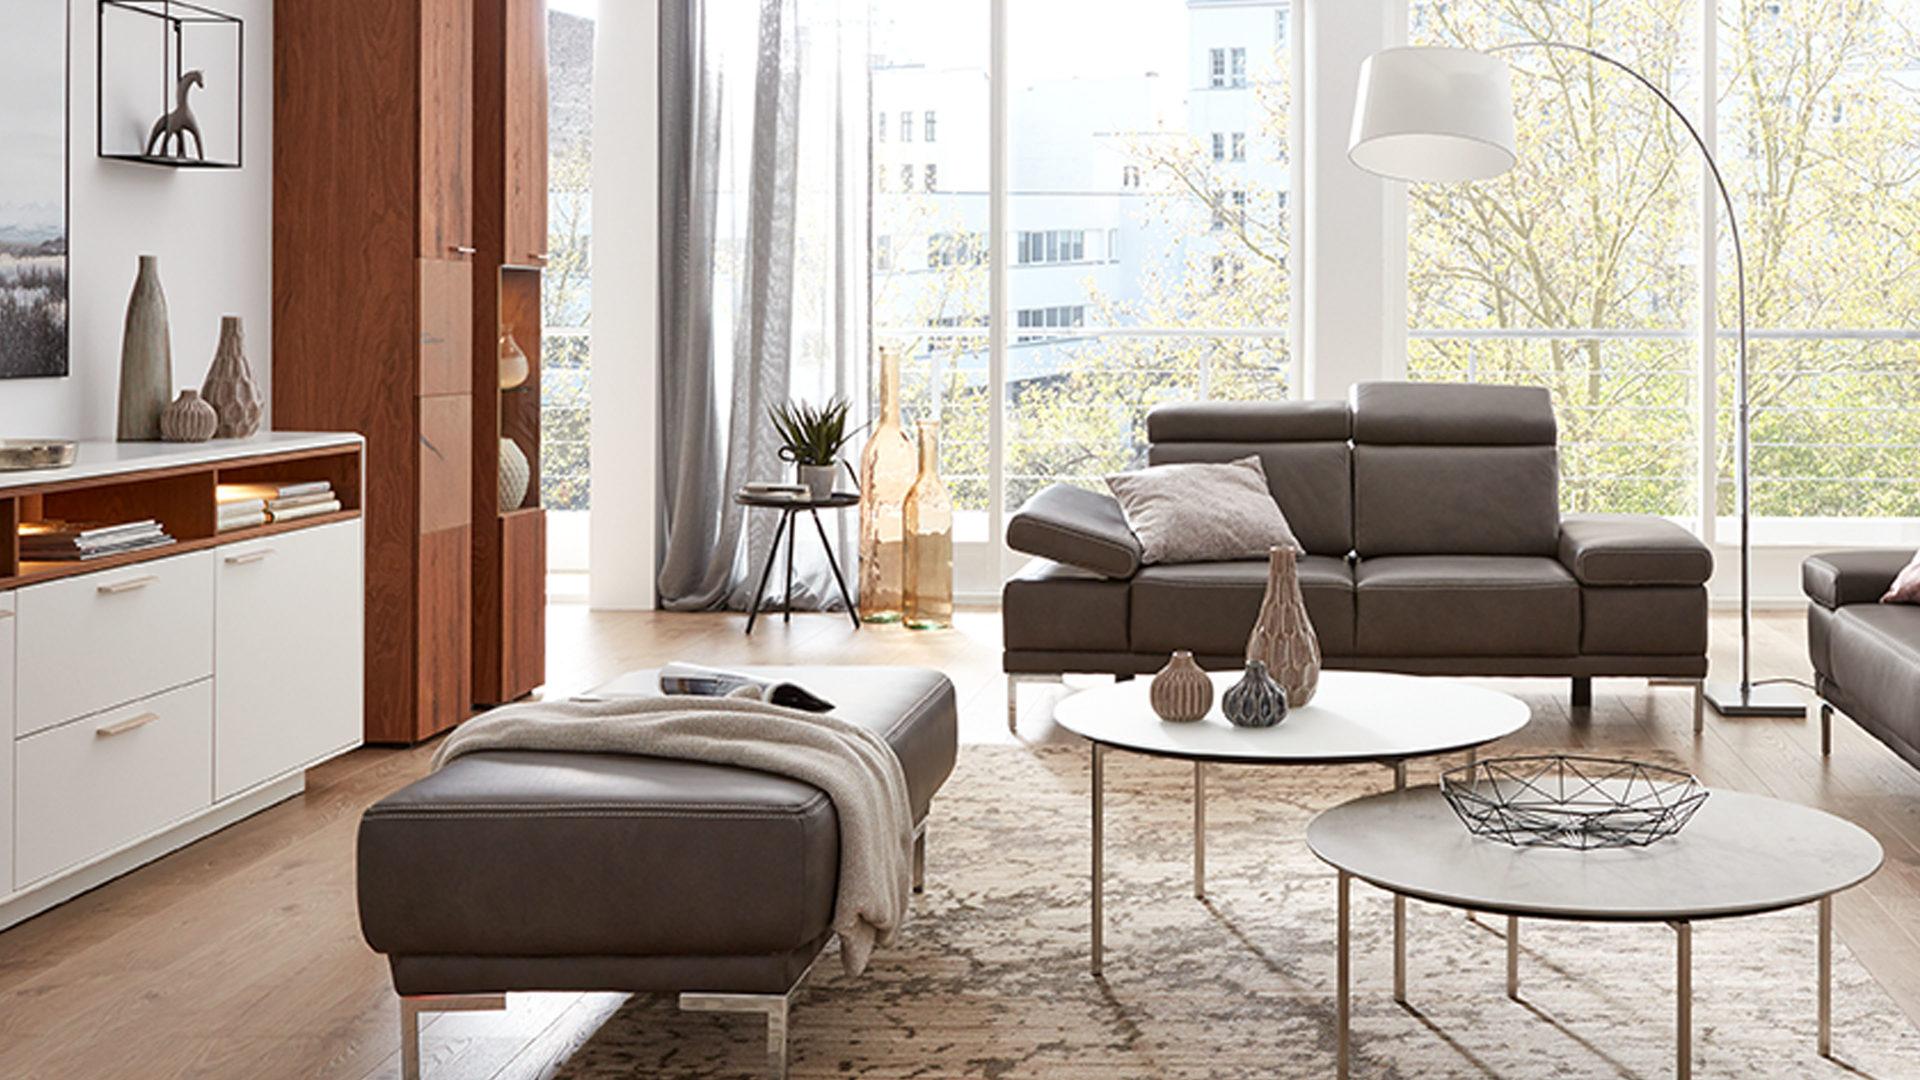 Interliving Sofa Serie 4251 Zweisitzer Dunkelgraues Leder Vintage